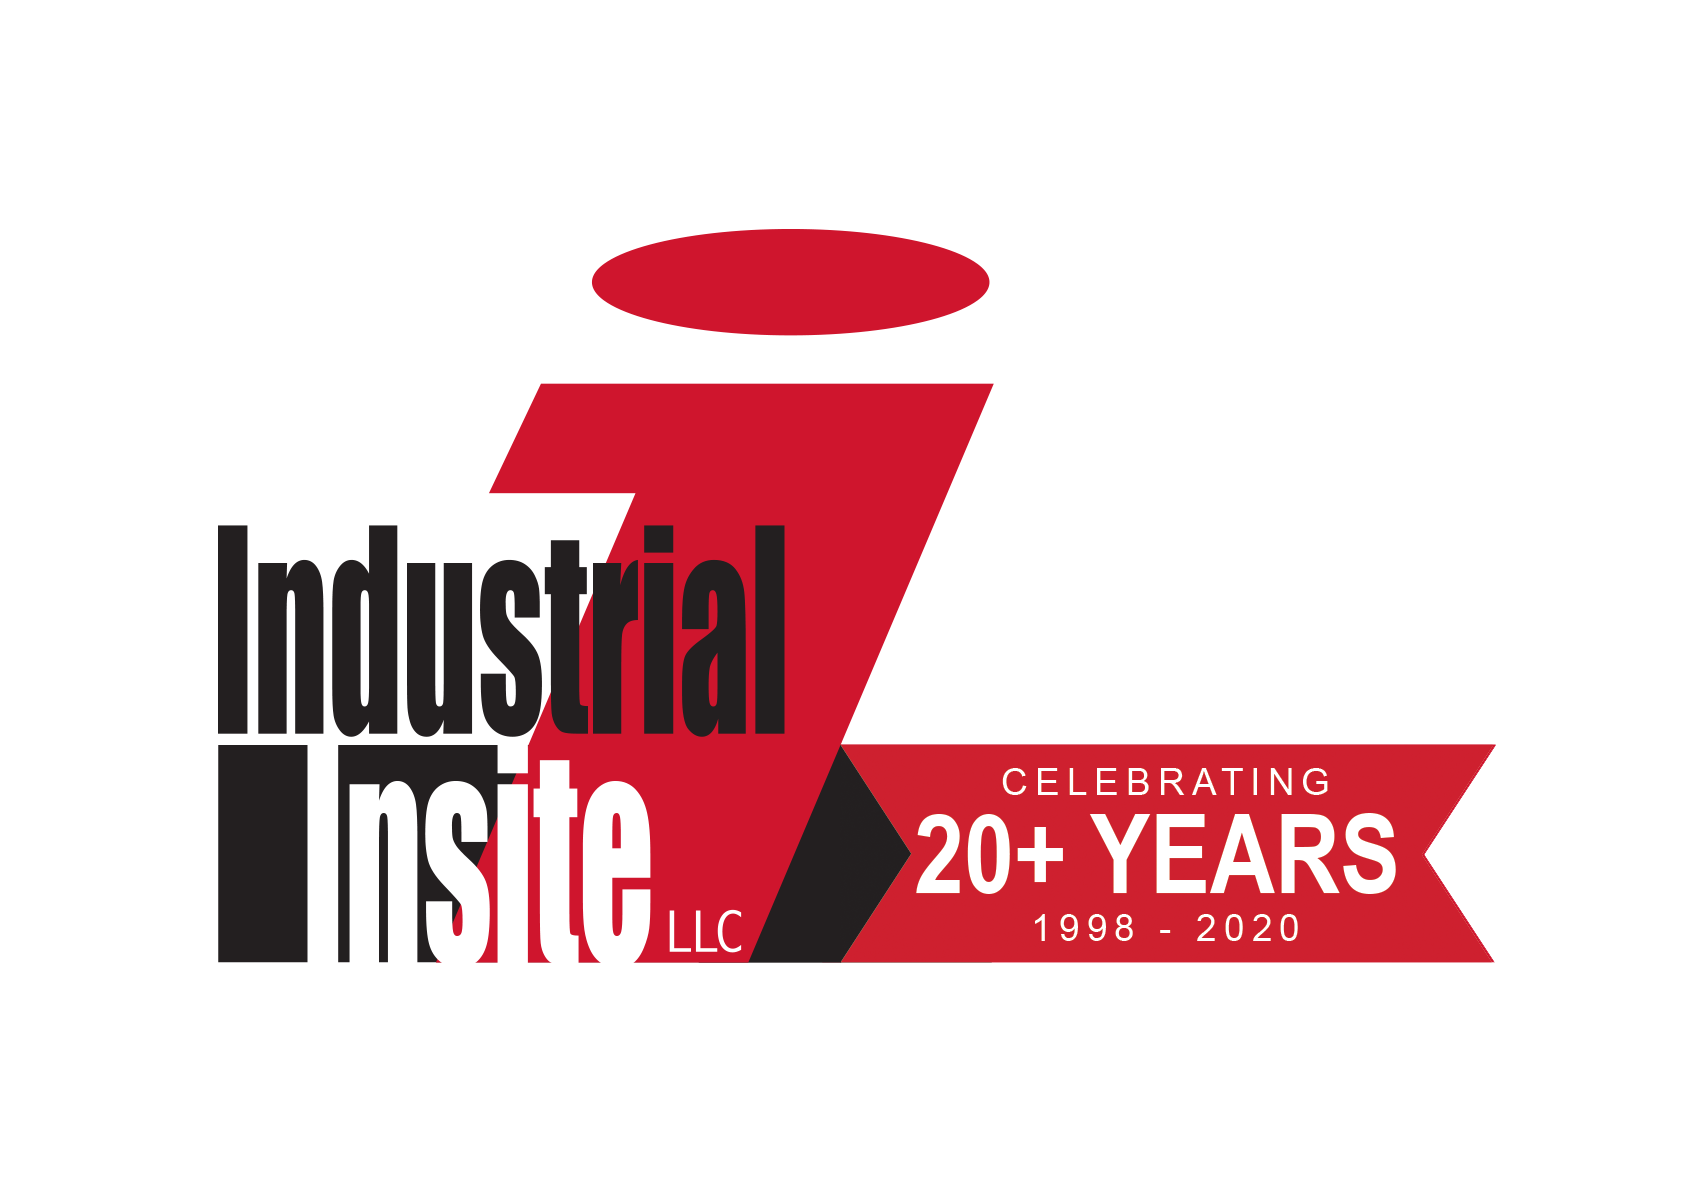 logo-for-transparent-header-anniversary-2019